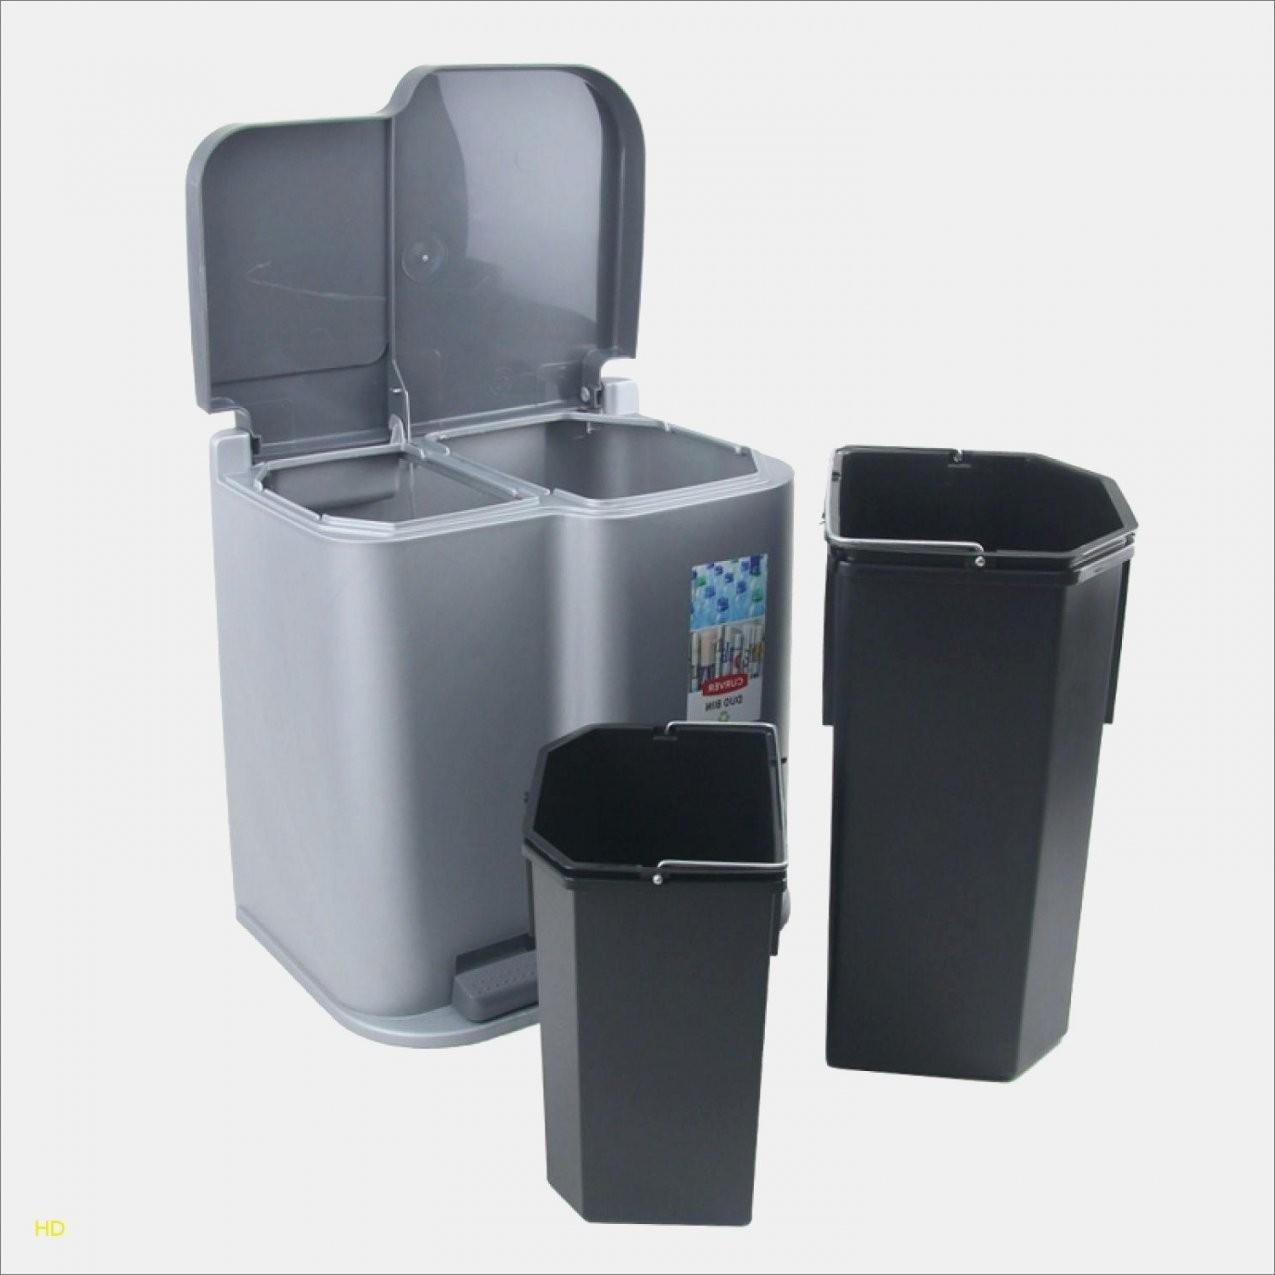 Mülleimer Küche Curver  Curver Decobin Slimbin Abfalleimer Auf von Design Mülleimer Küche Bild